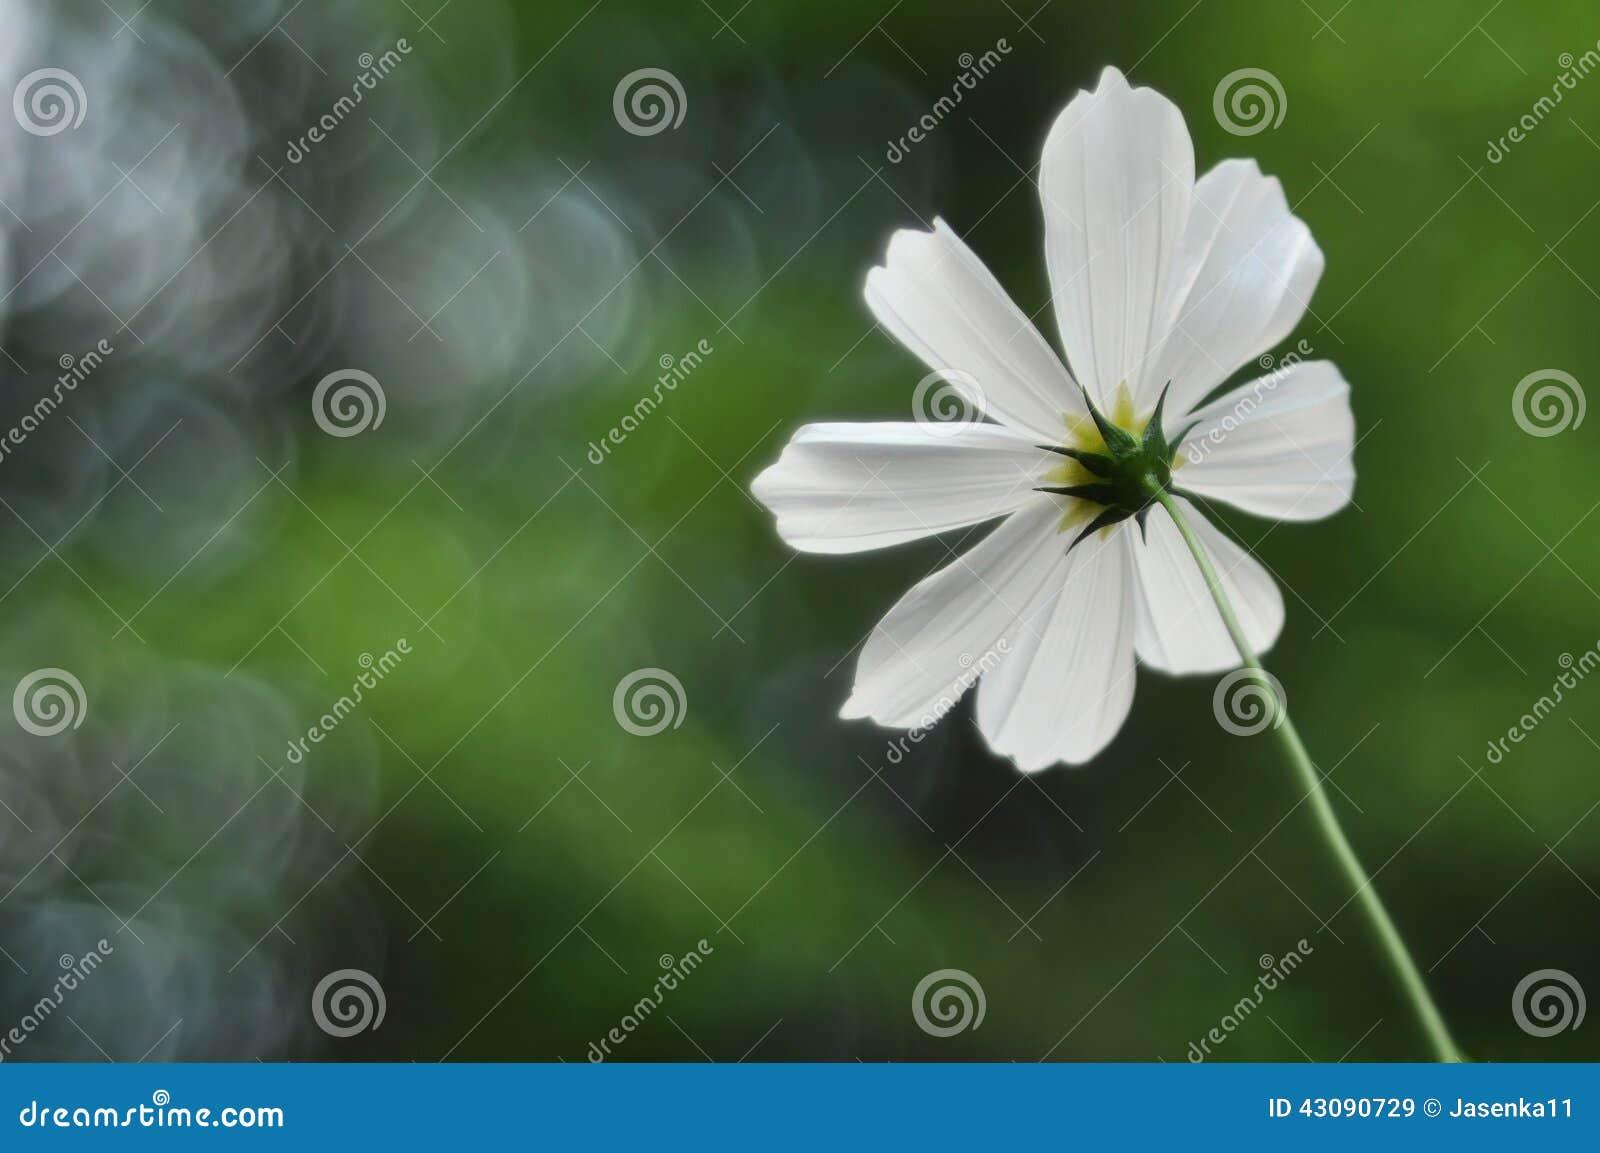 Single white cosmo flower stock image image of head 43090729 download single white cosmo flower stock image image of head 43090729 mightylinksfo